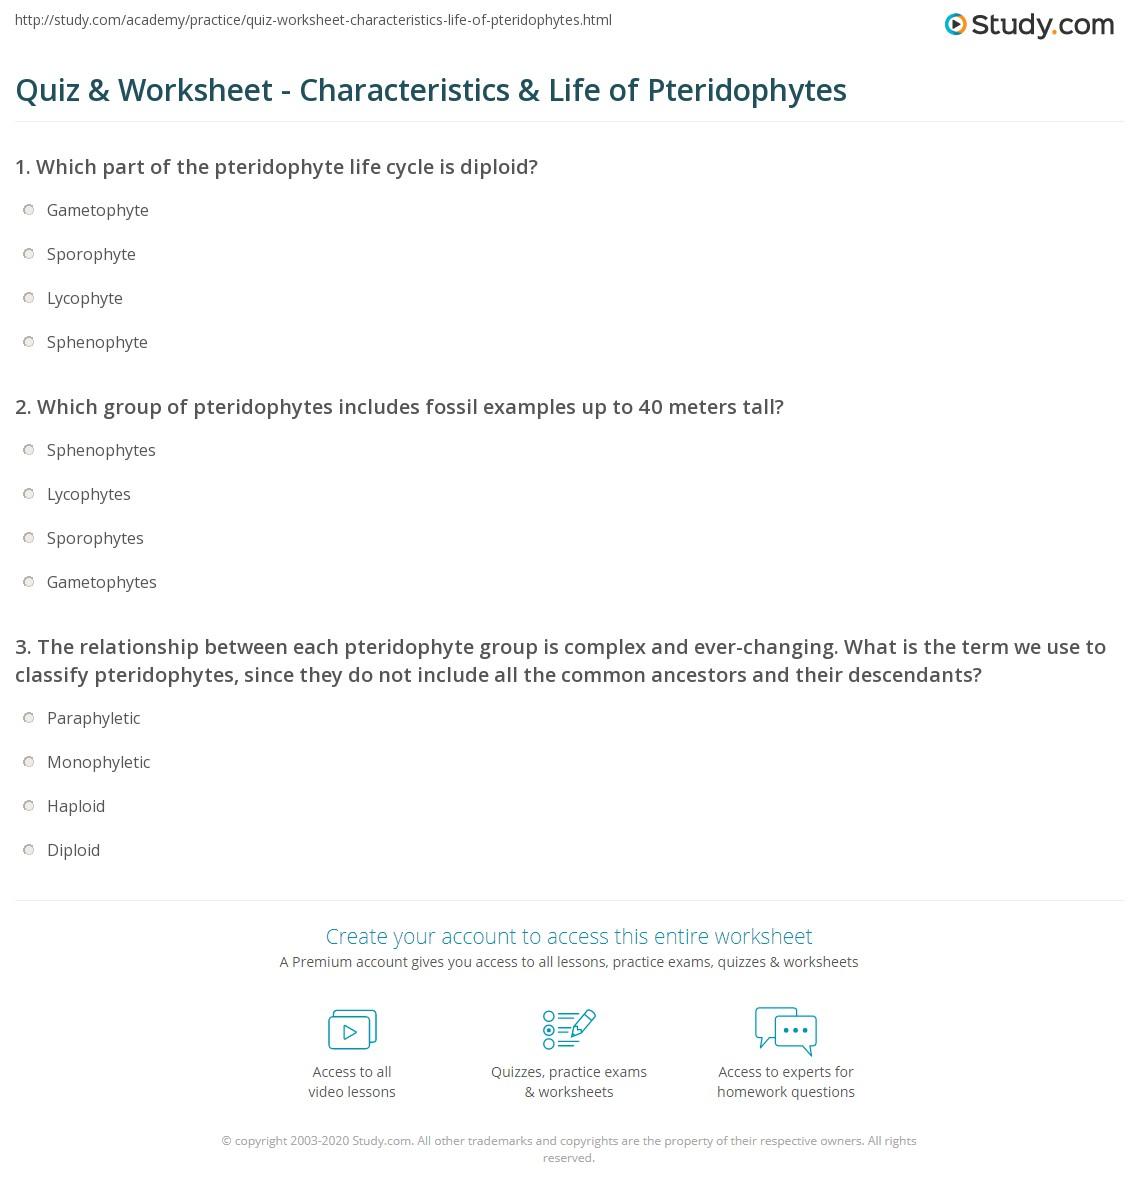 quiz worksheet characteristics life of pteridophytes. Black Bedroom Furniture Sets. Home Design Ideas